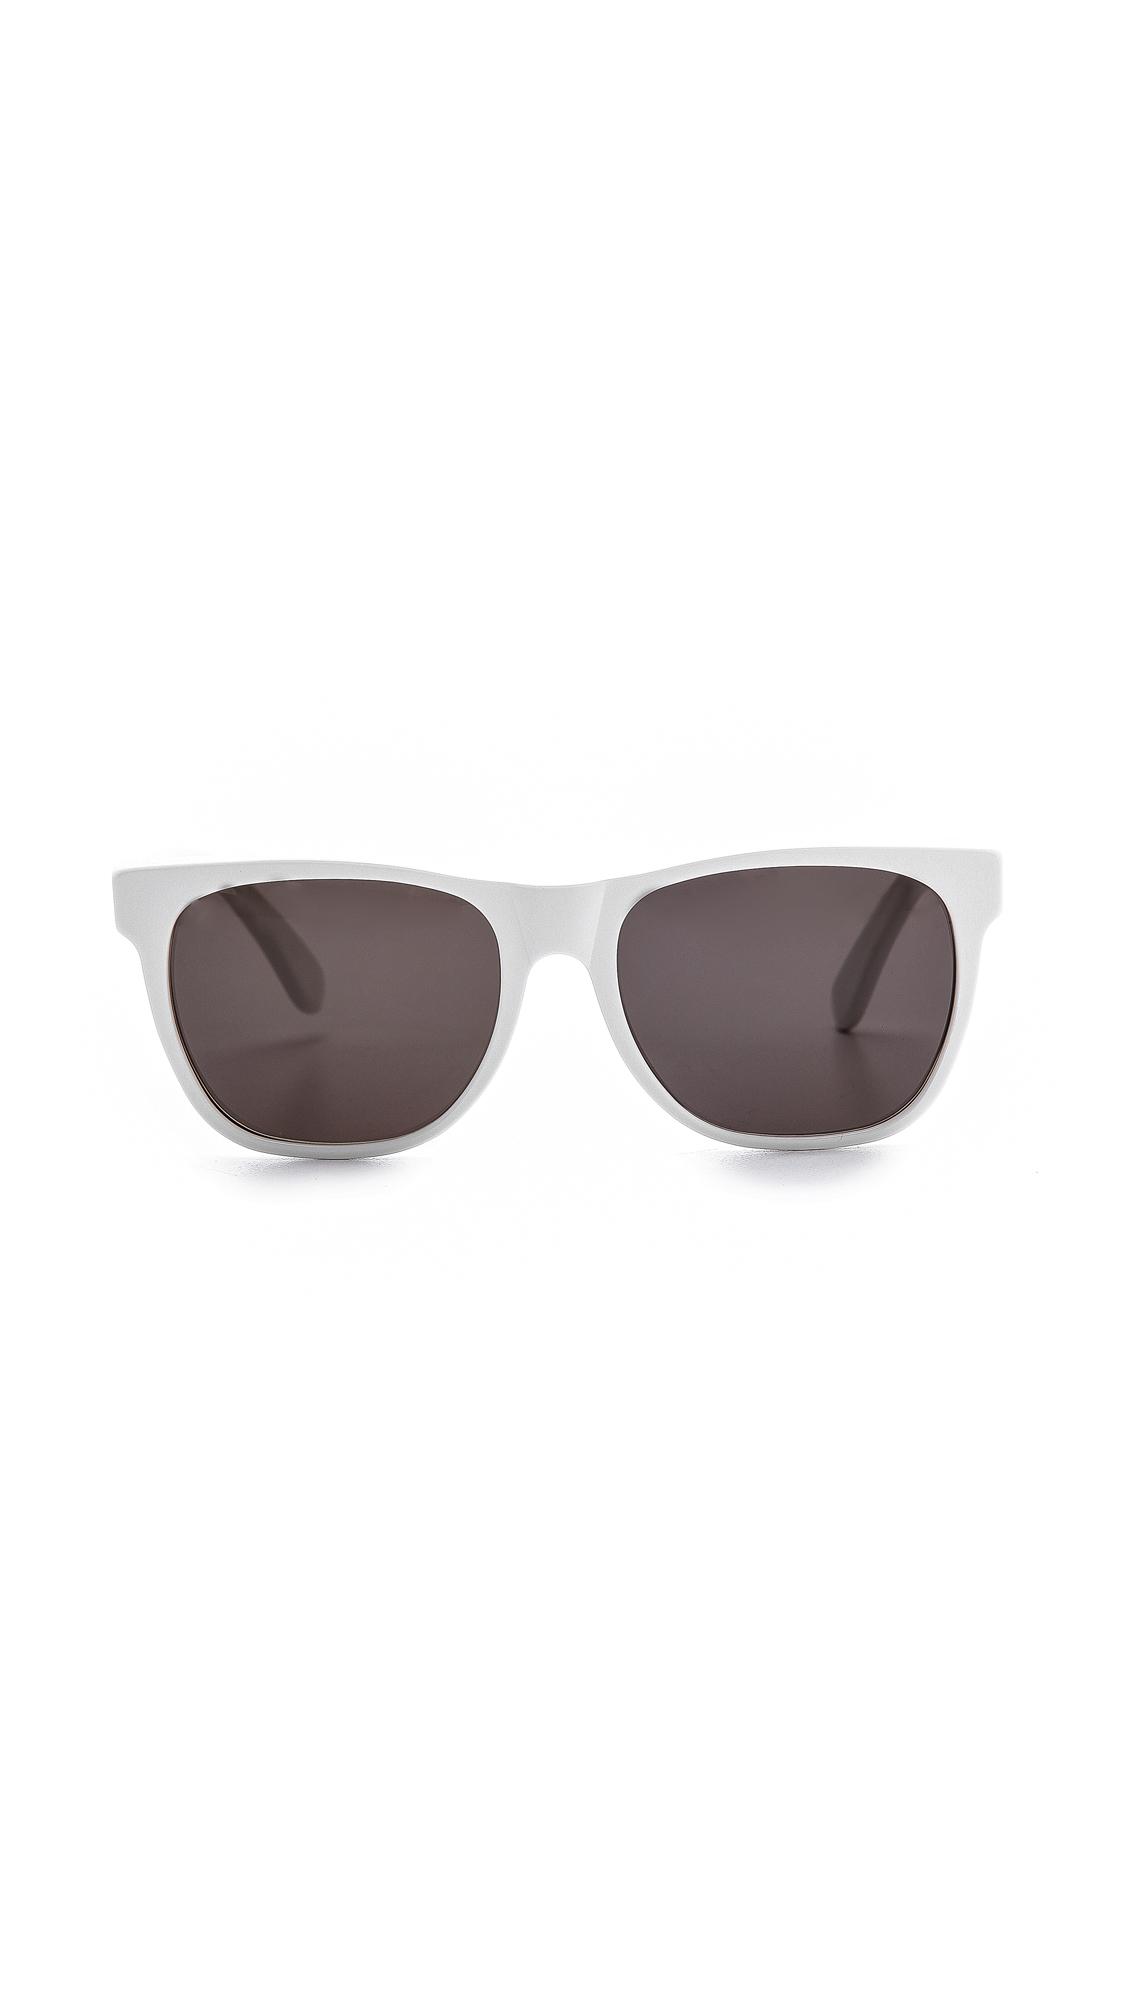 white oakley ski goggles atru  ray ban 3025 aviator sunglasses gold